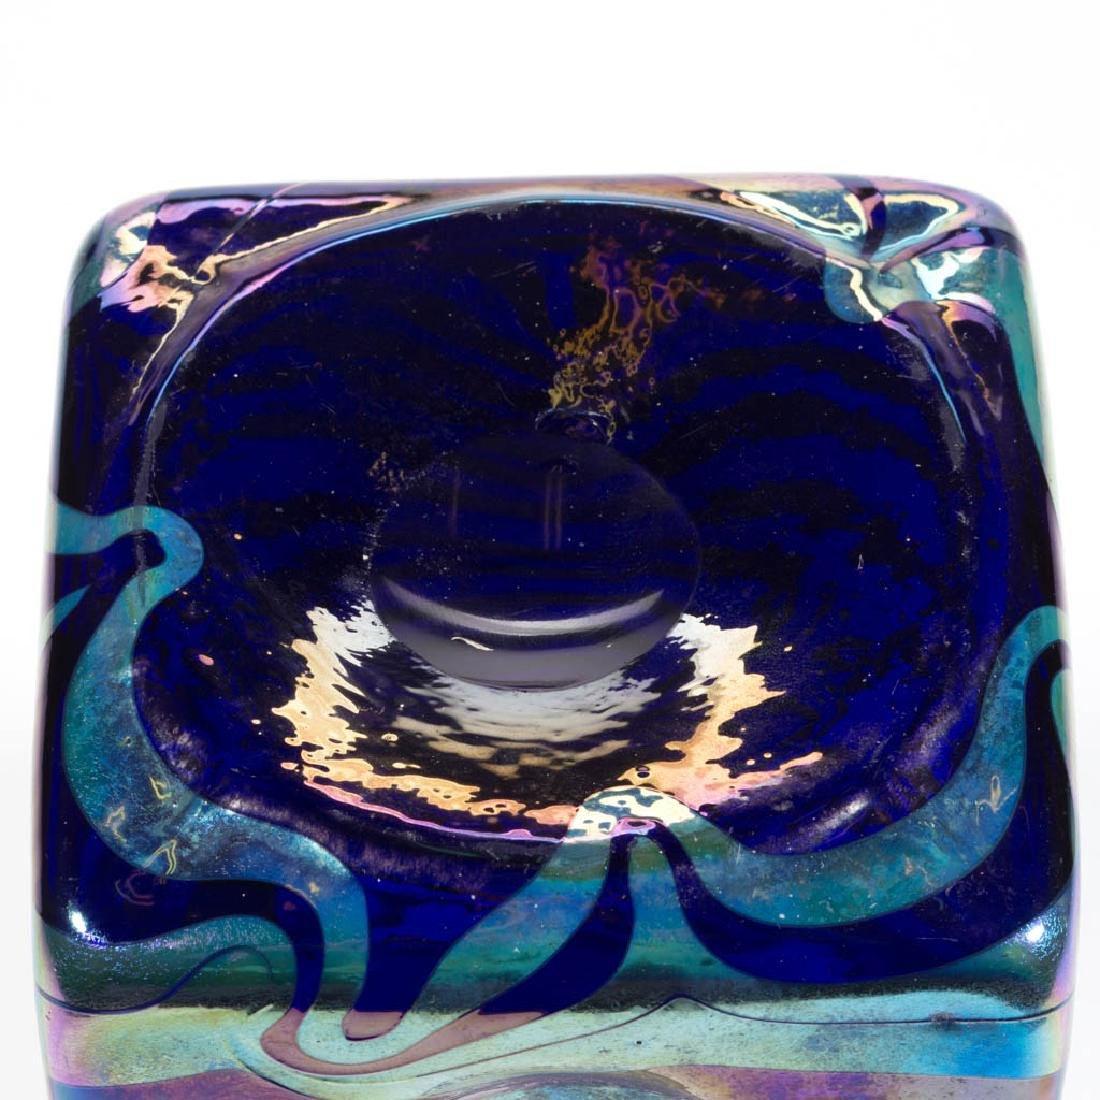 FRITZ HECKERT CHANGEART ART GLASS VASE - 3